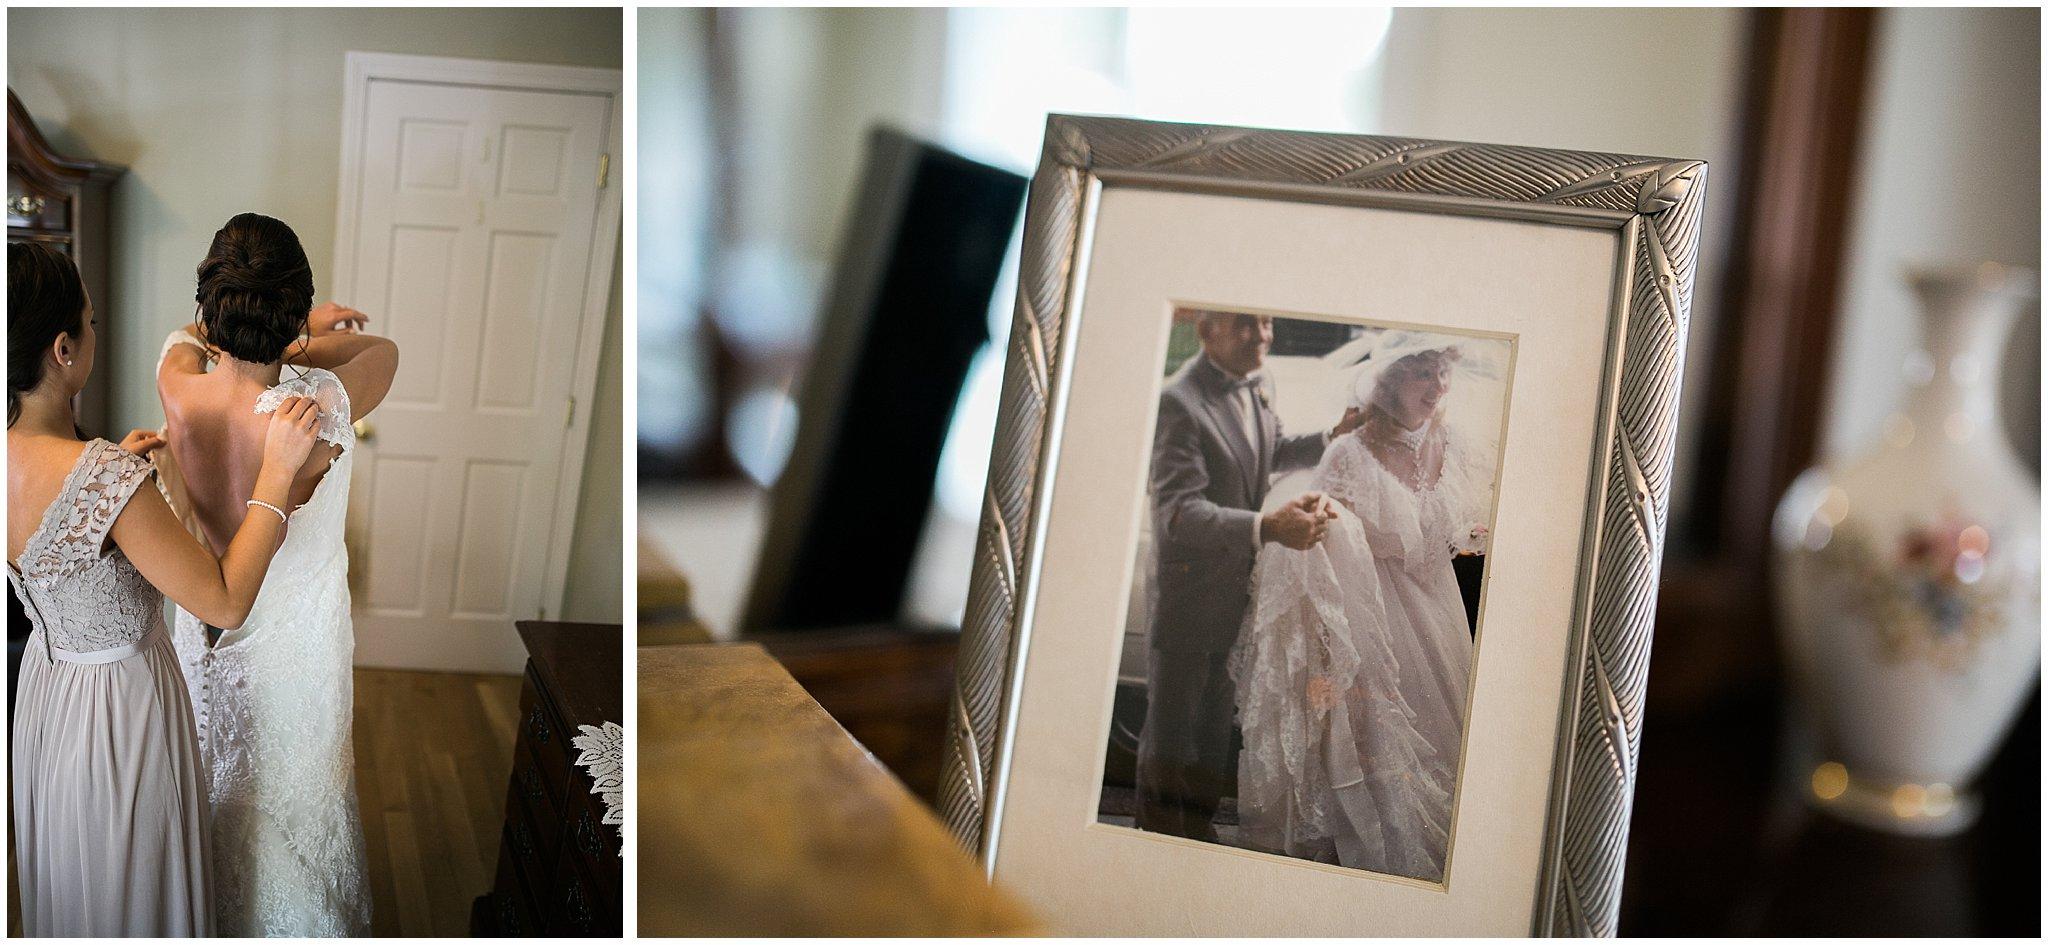 Seaport Hotel Wedding Boston Photographer Sweet Alice12.jpg